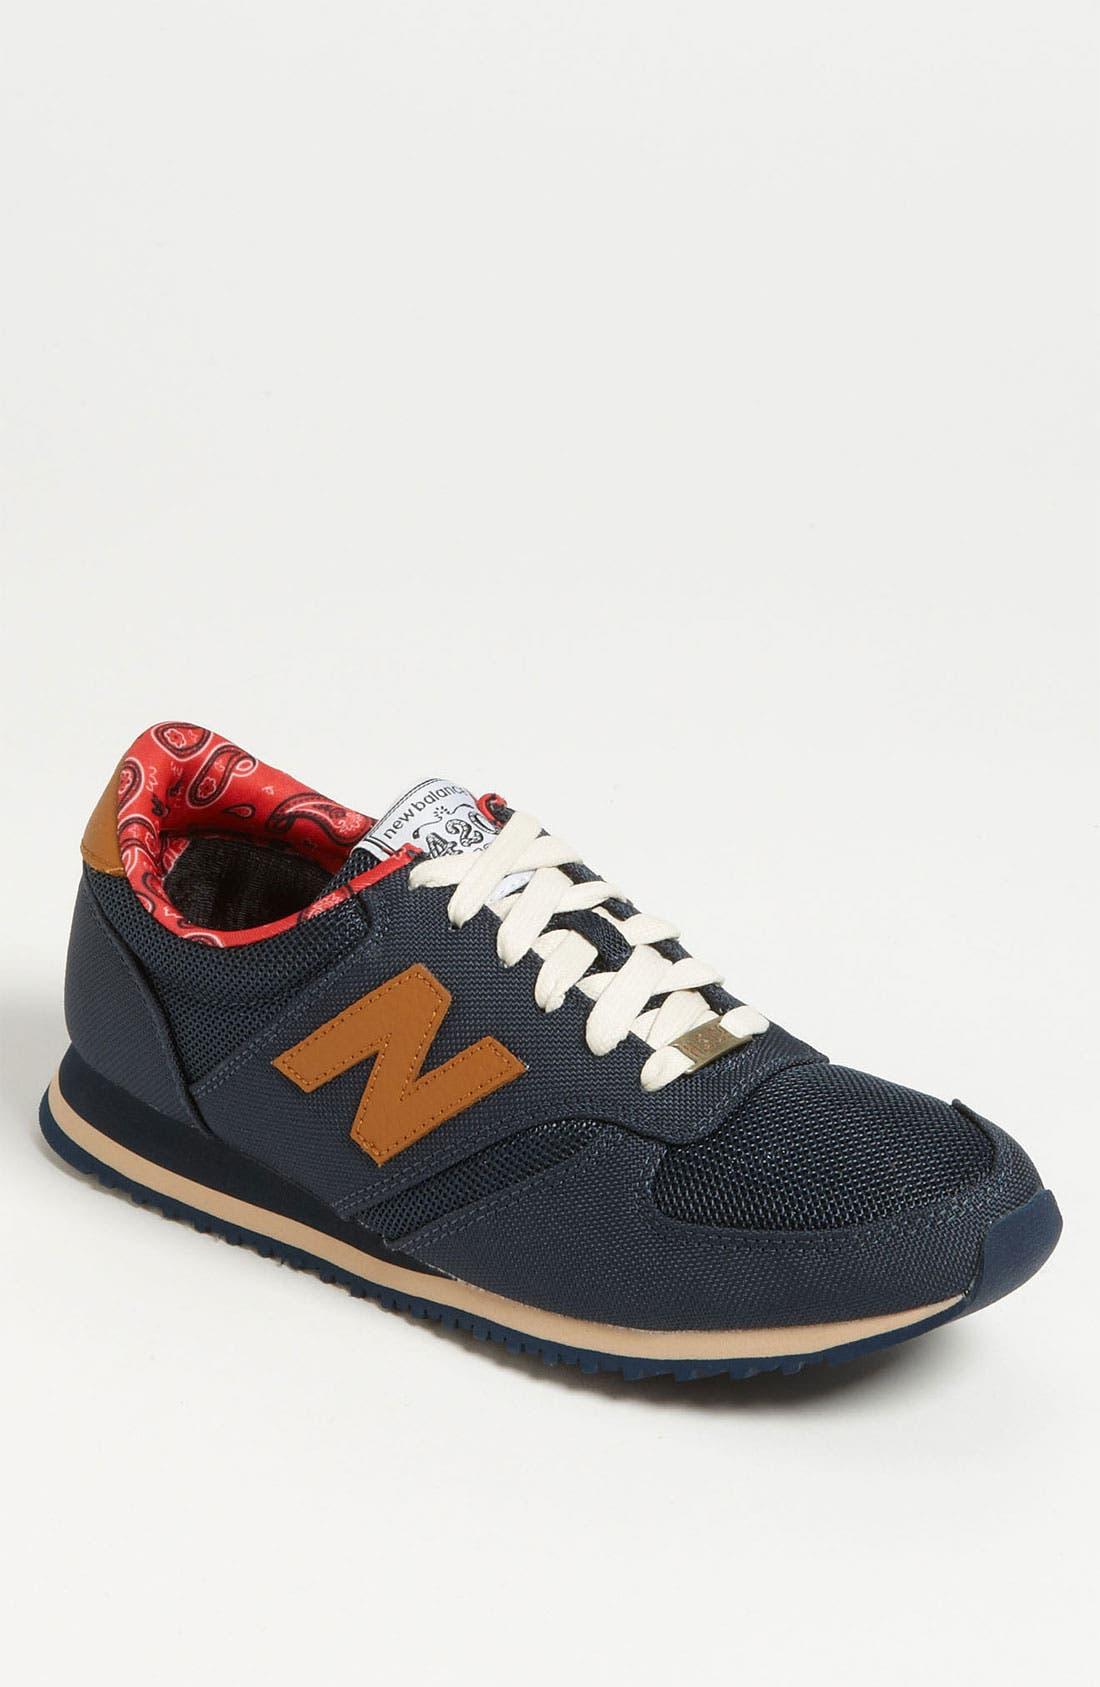 Main Image - New Balance 'Herschel Supply Co. - 420' Sneaker (Men)